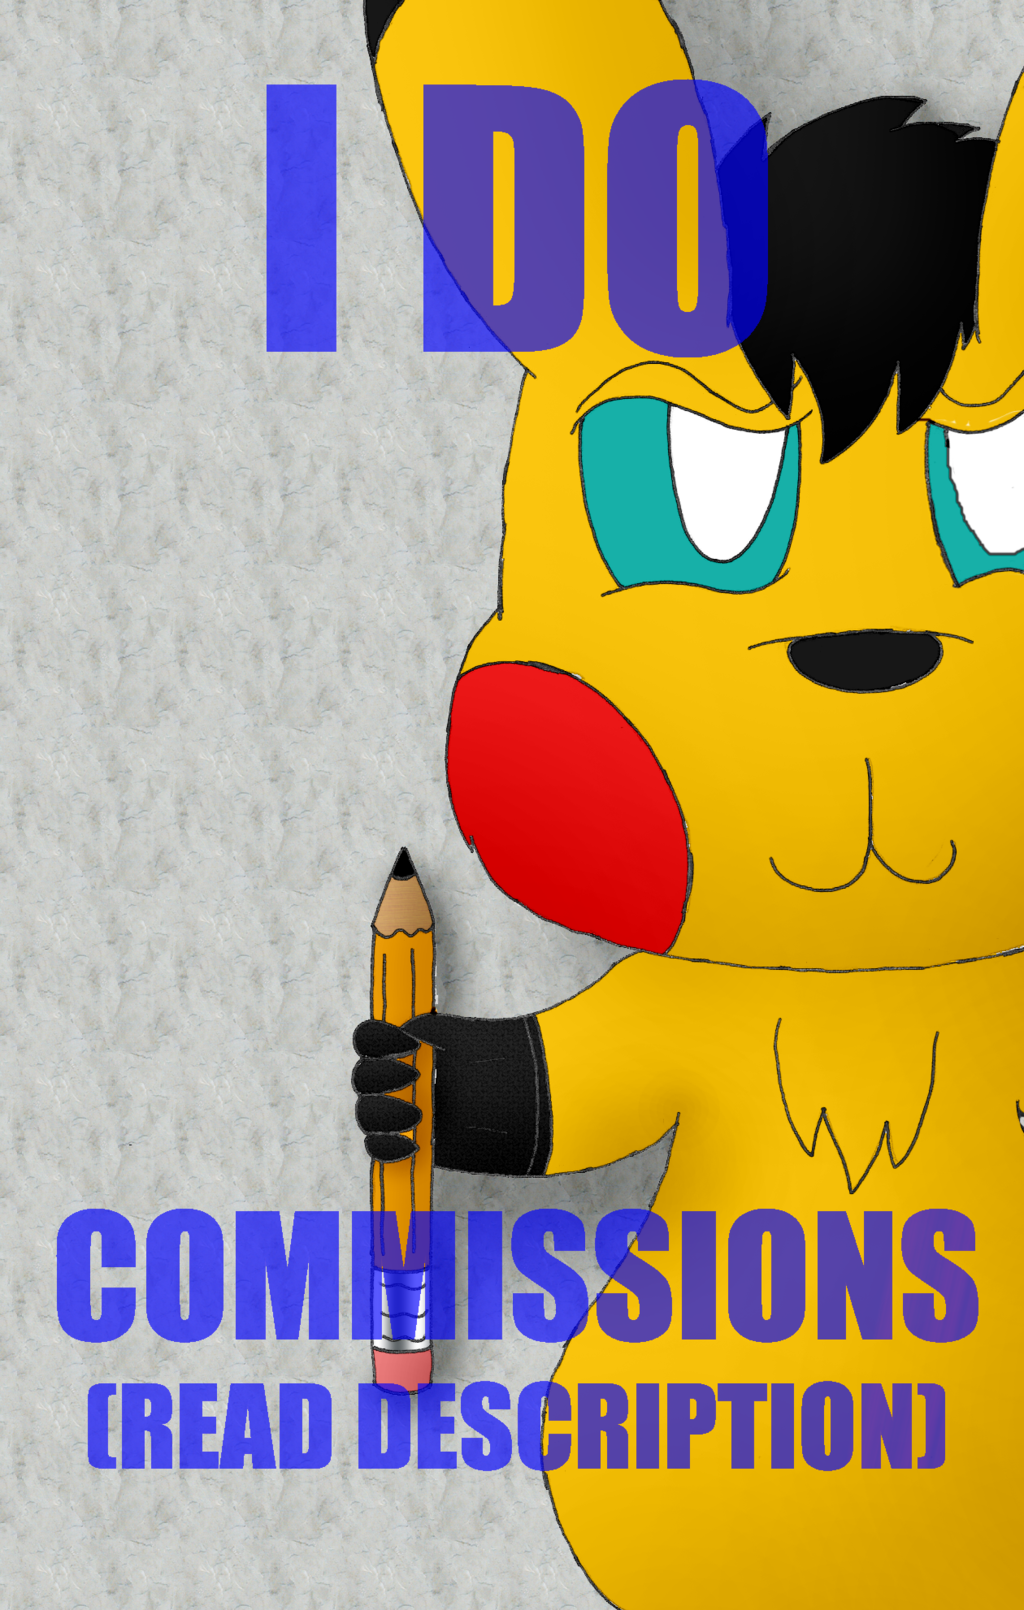 I Draw Commissions! (Read Description)